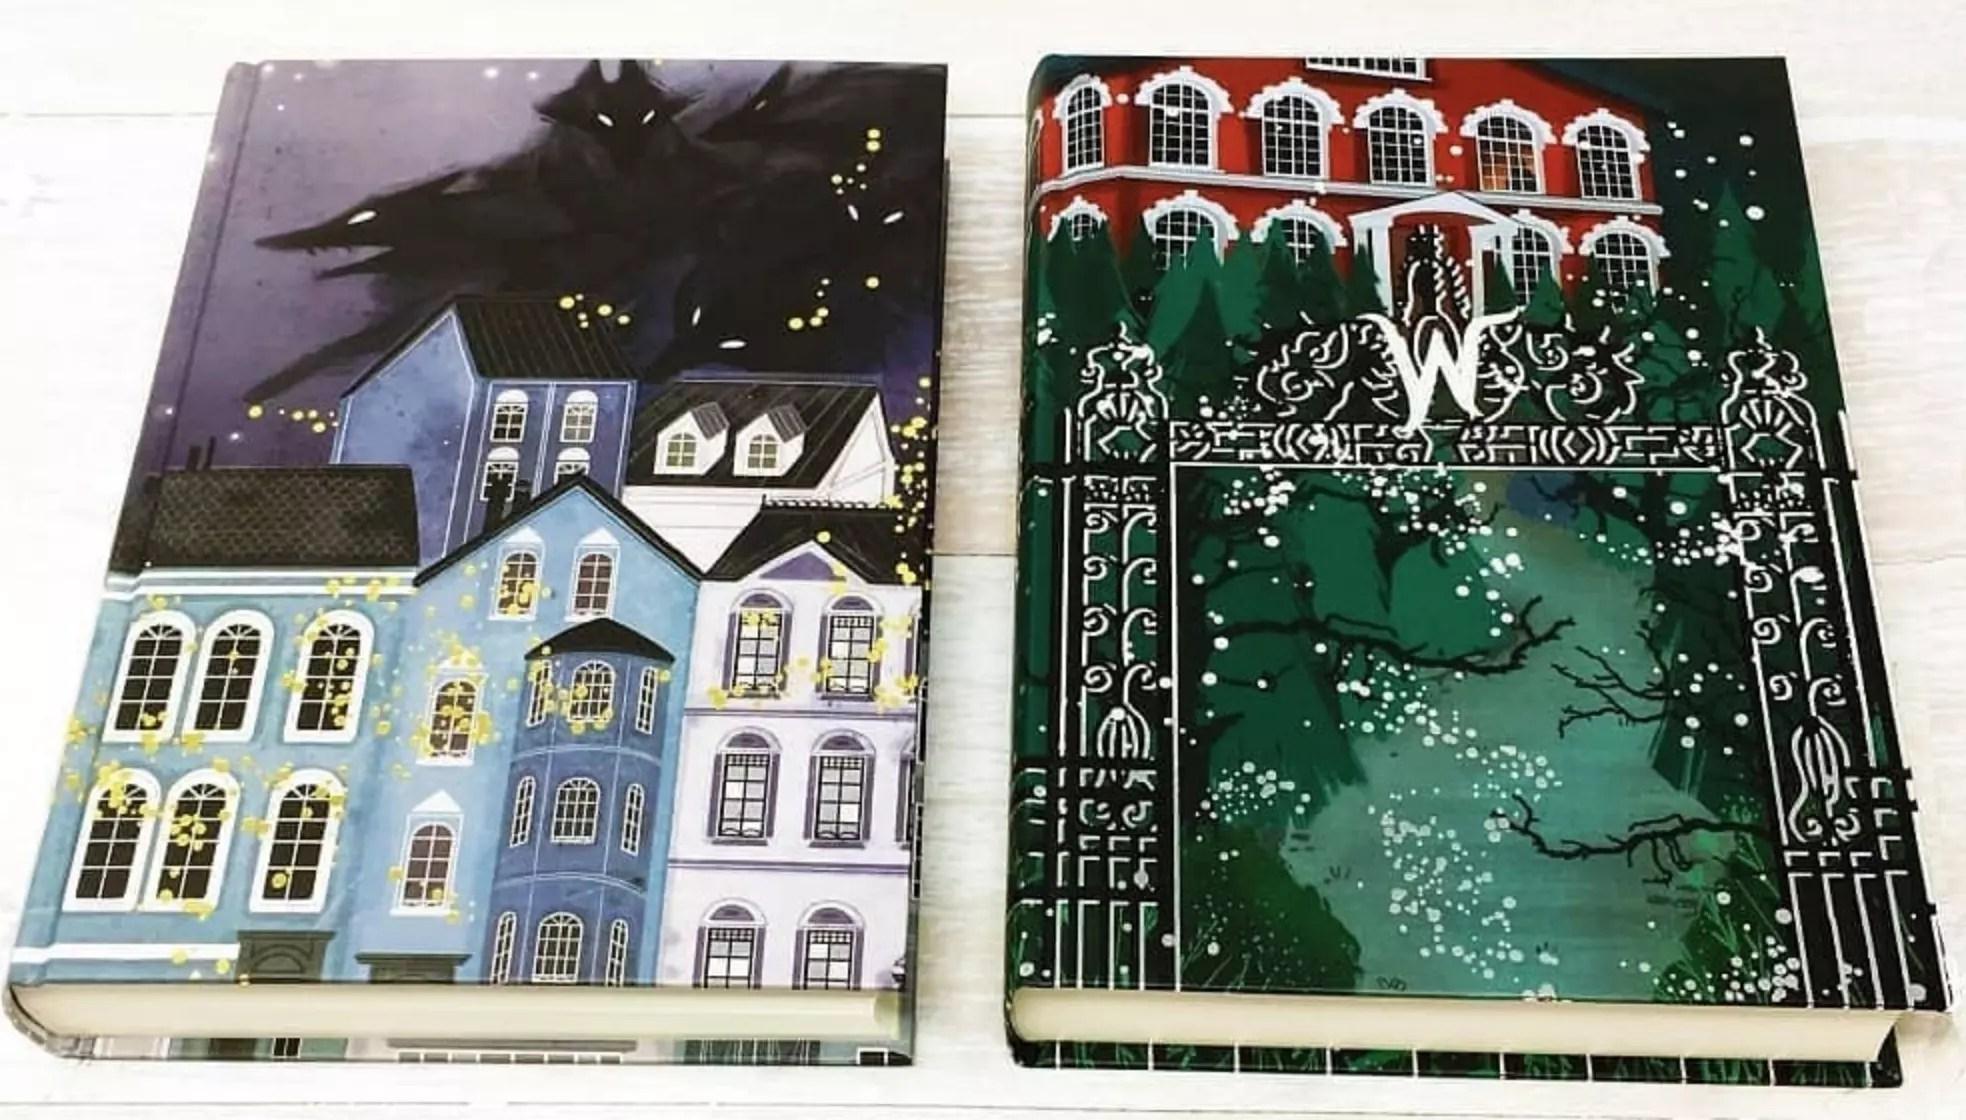 wundersmith and nevermoor